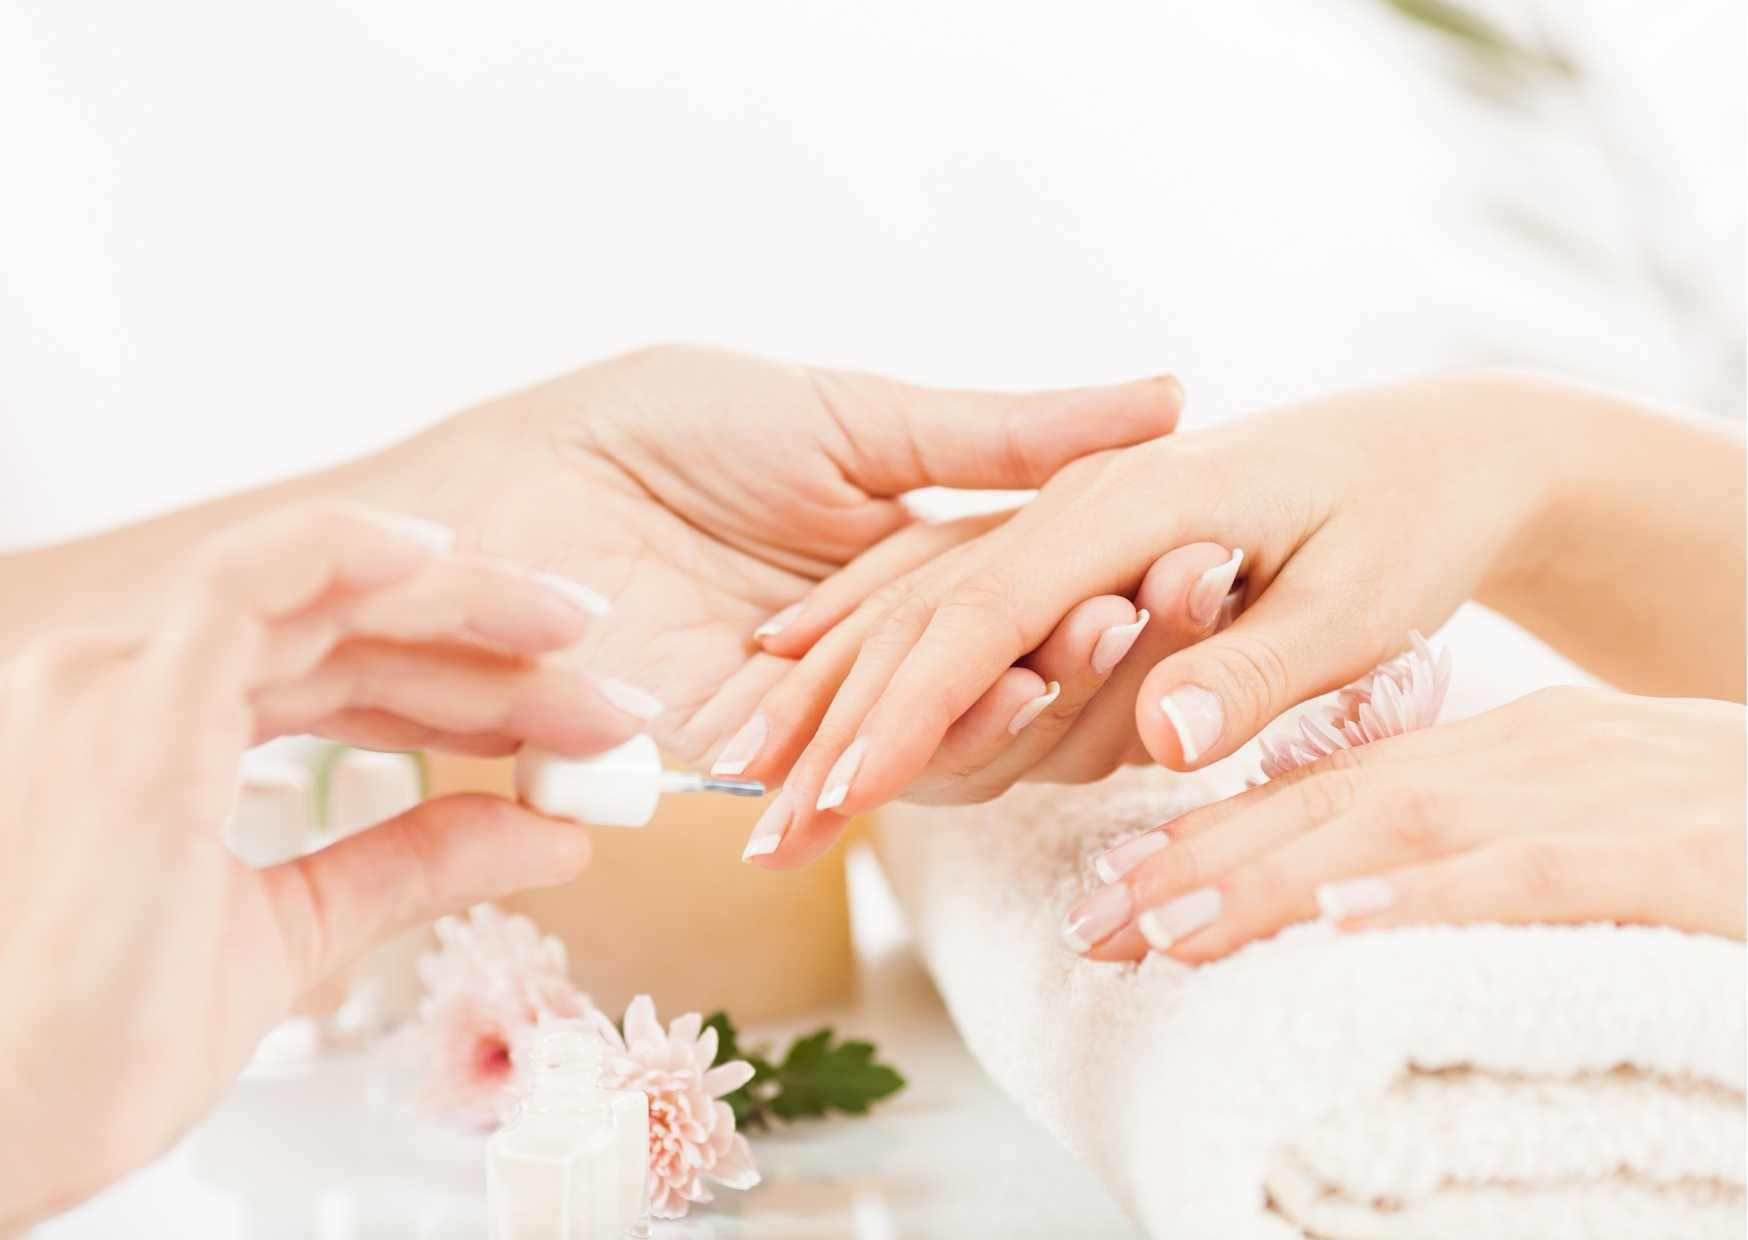 Manicure Inverness